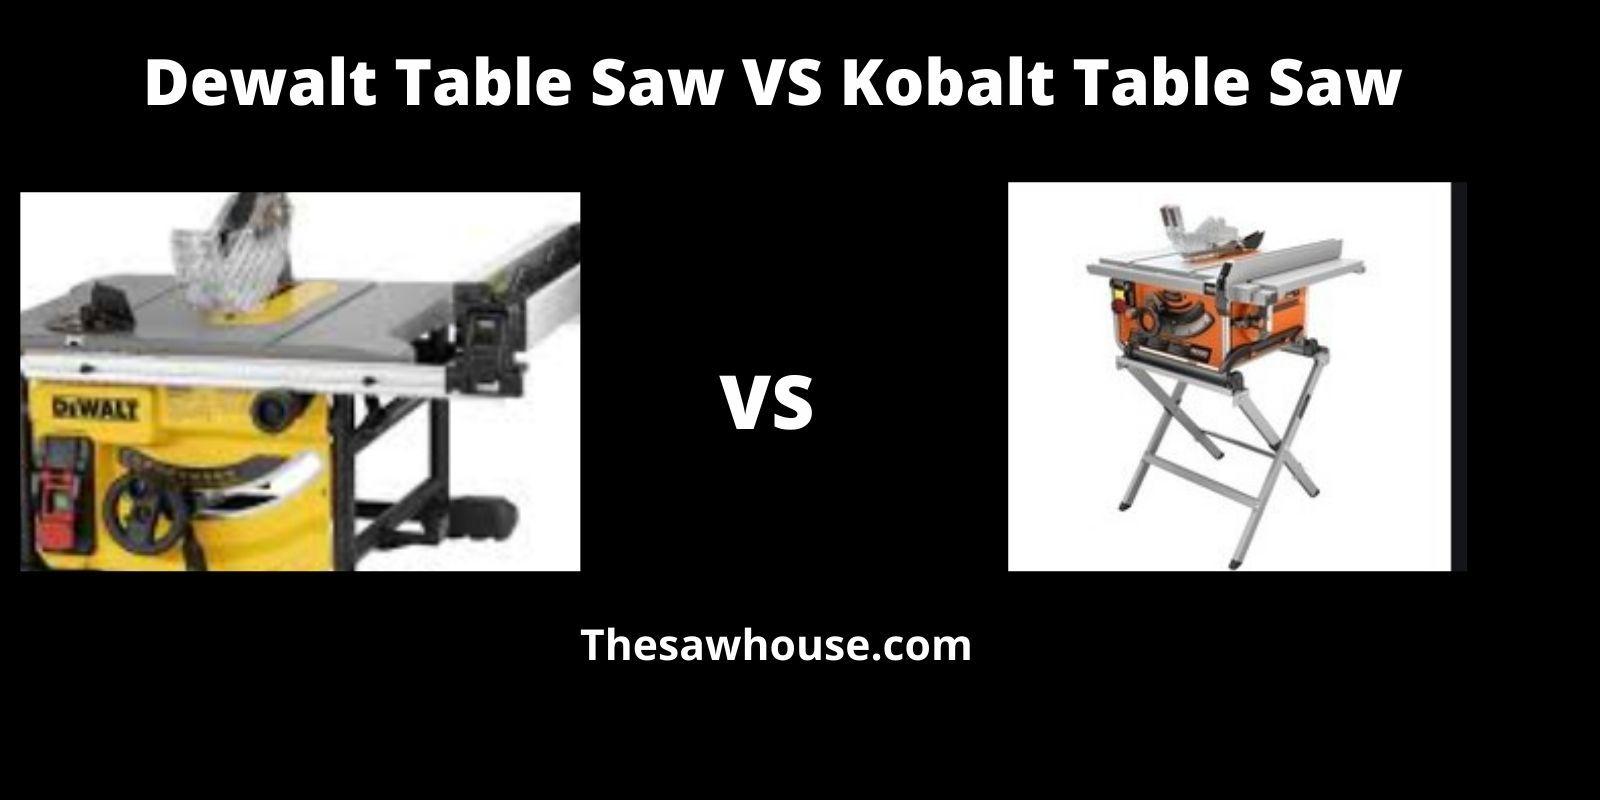 Dewalt Table Saw VS Kobalt Table Saw.